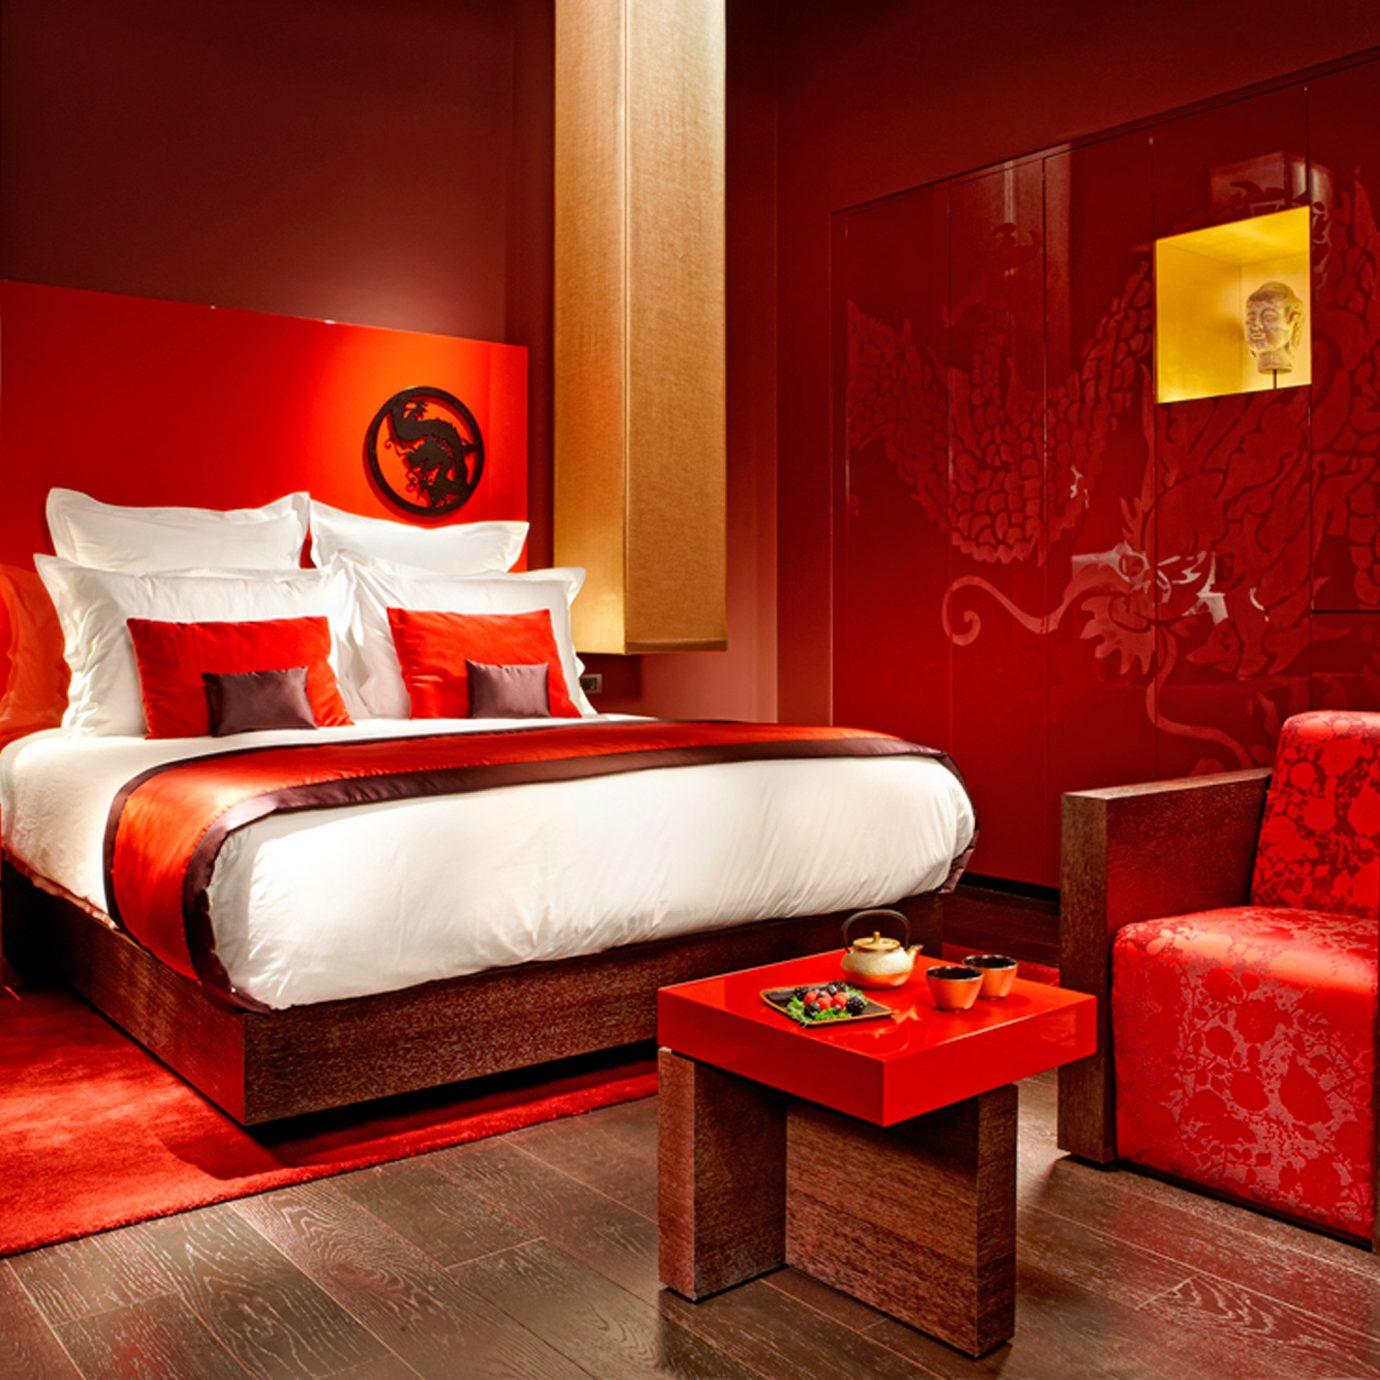 Bedroom City Cultural Modern red sofa Suite orange